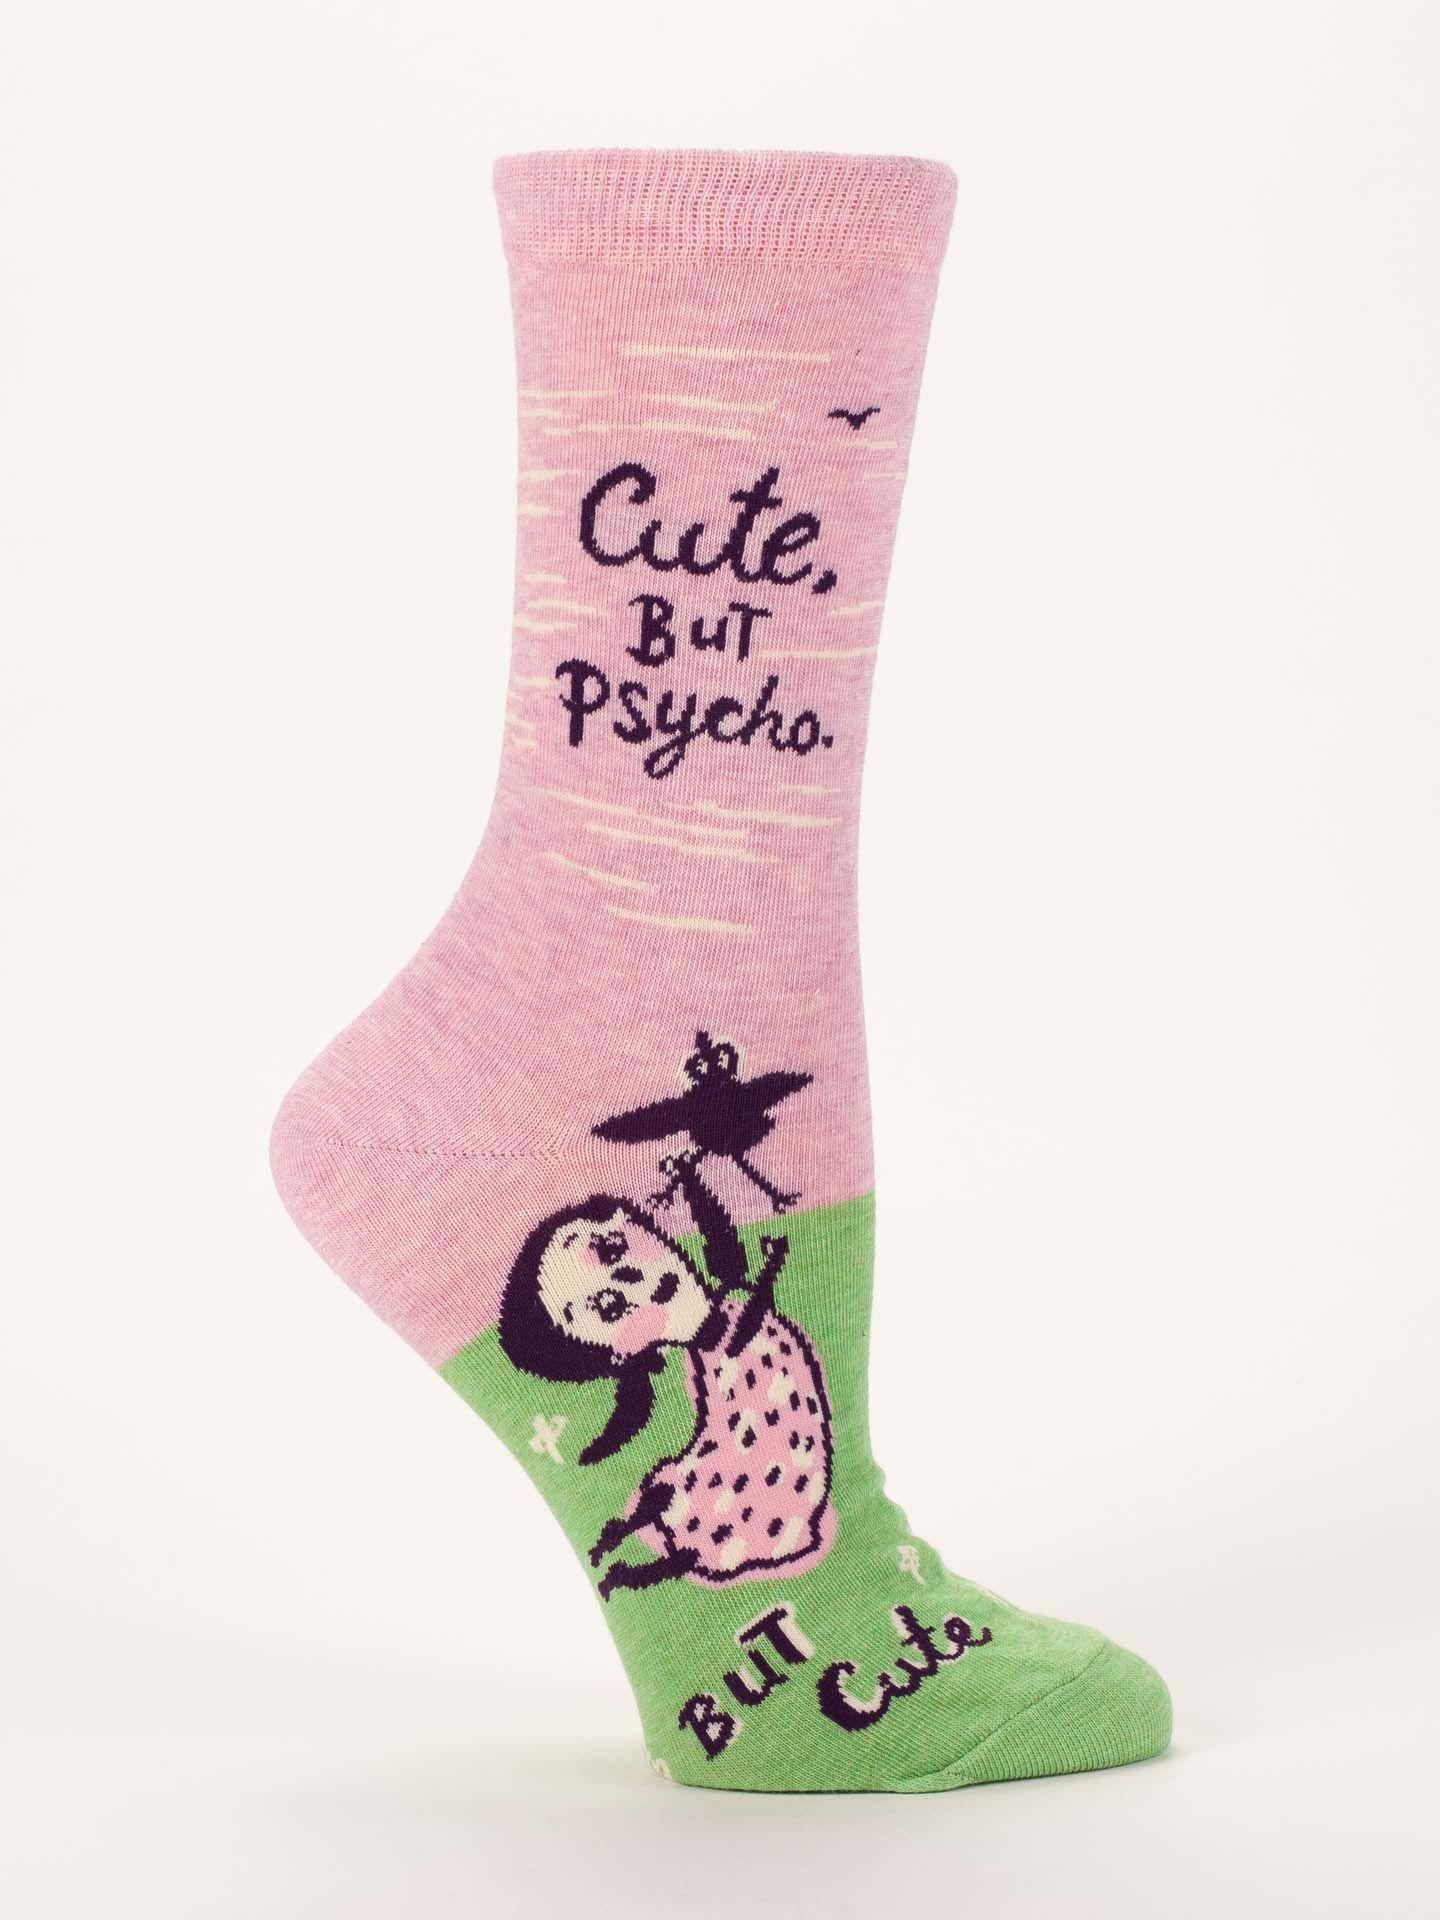 e6148d29faf94 Blue Q Women's Cute. But Psycho, but Cute Socks - Free Shipping!